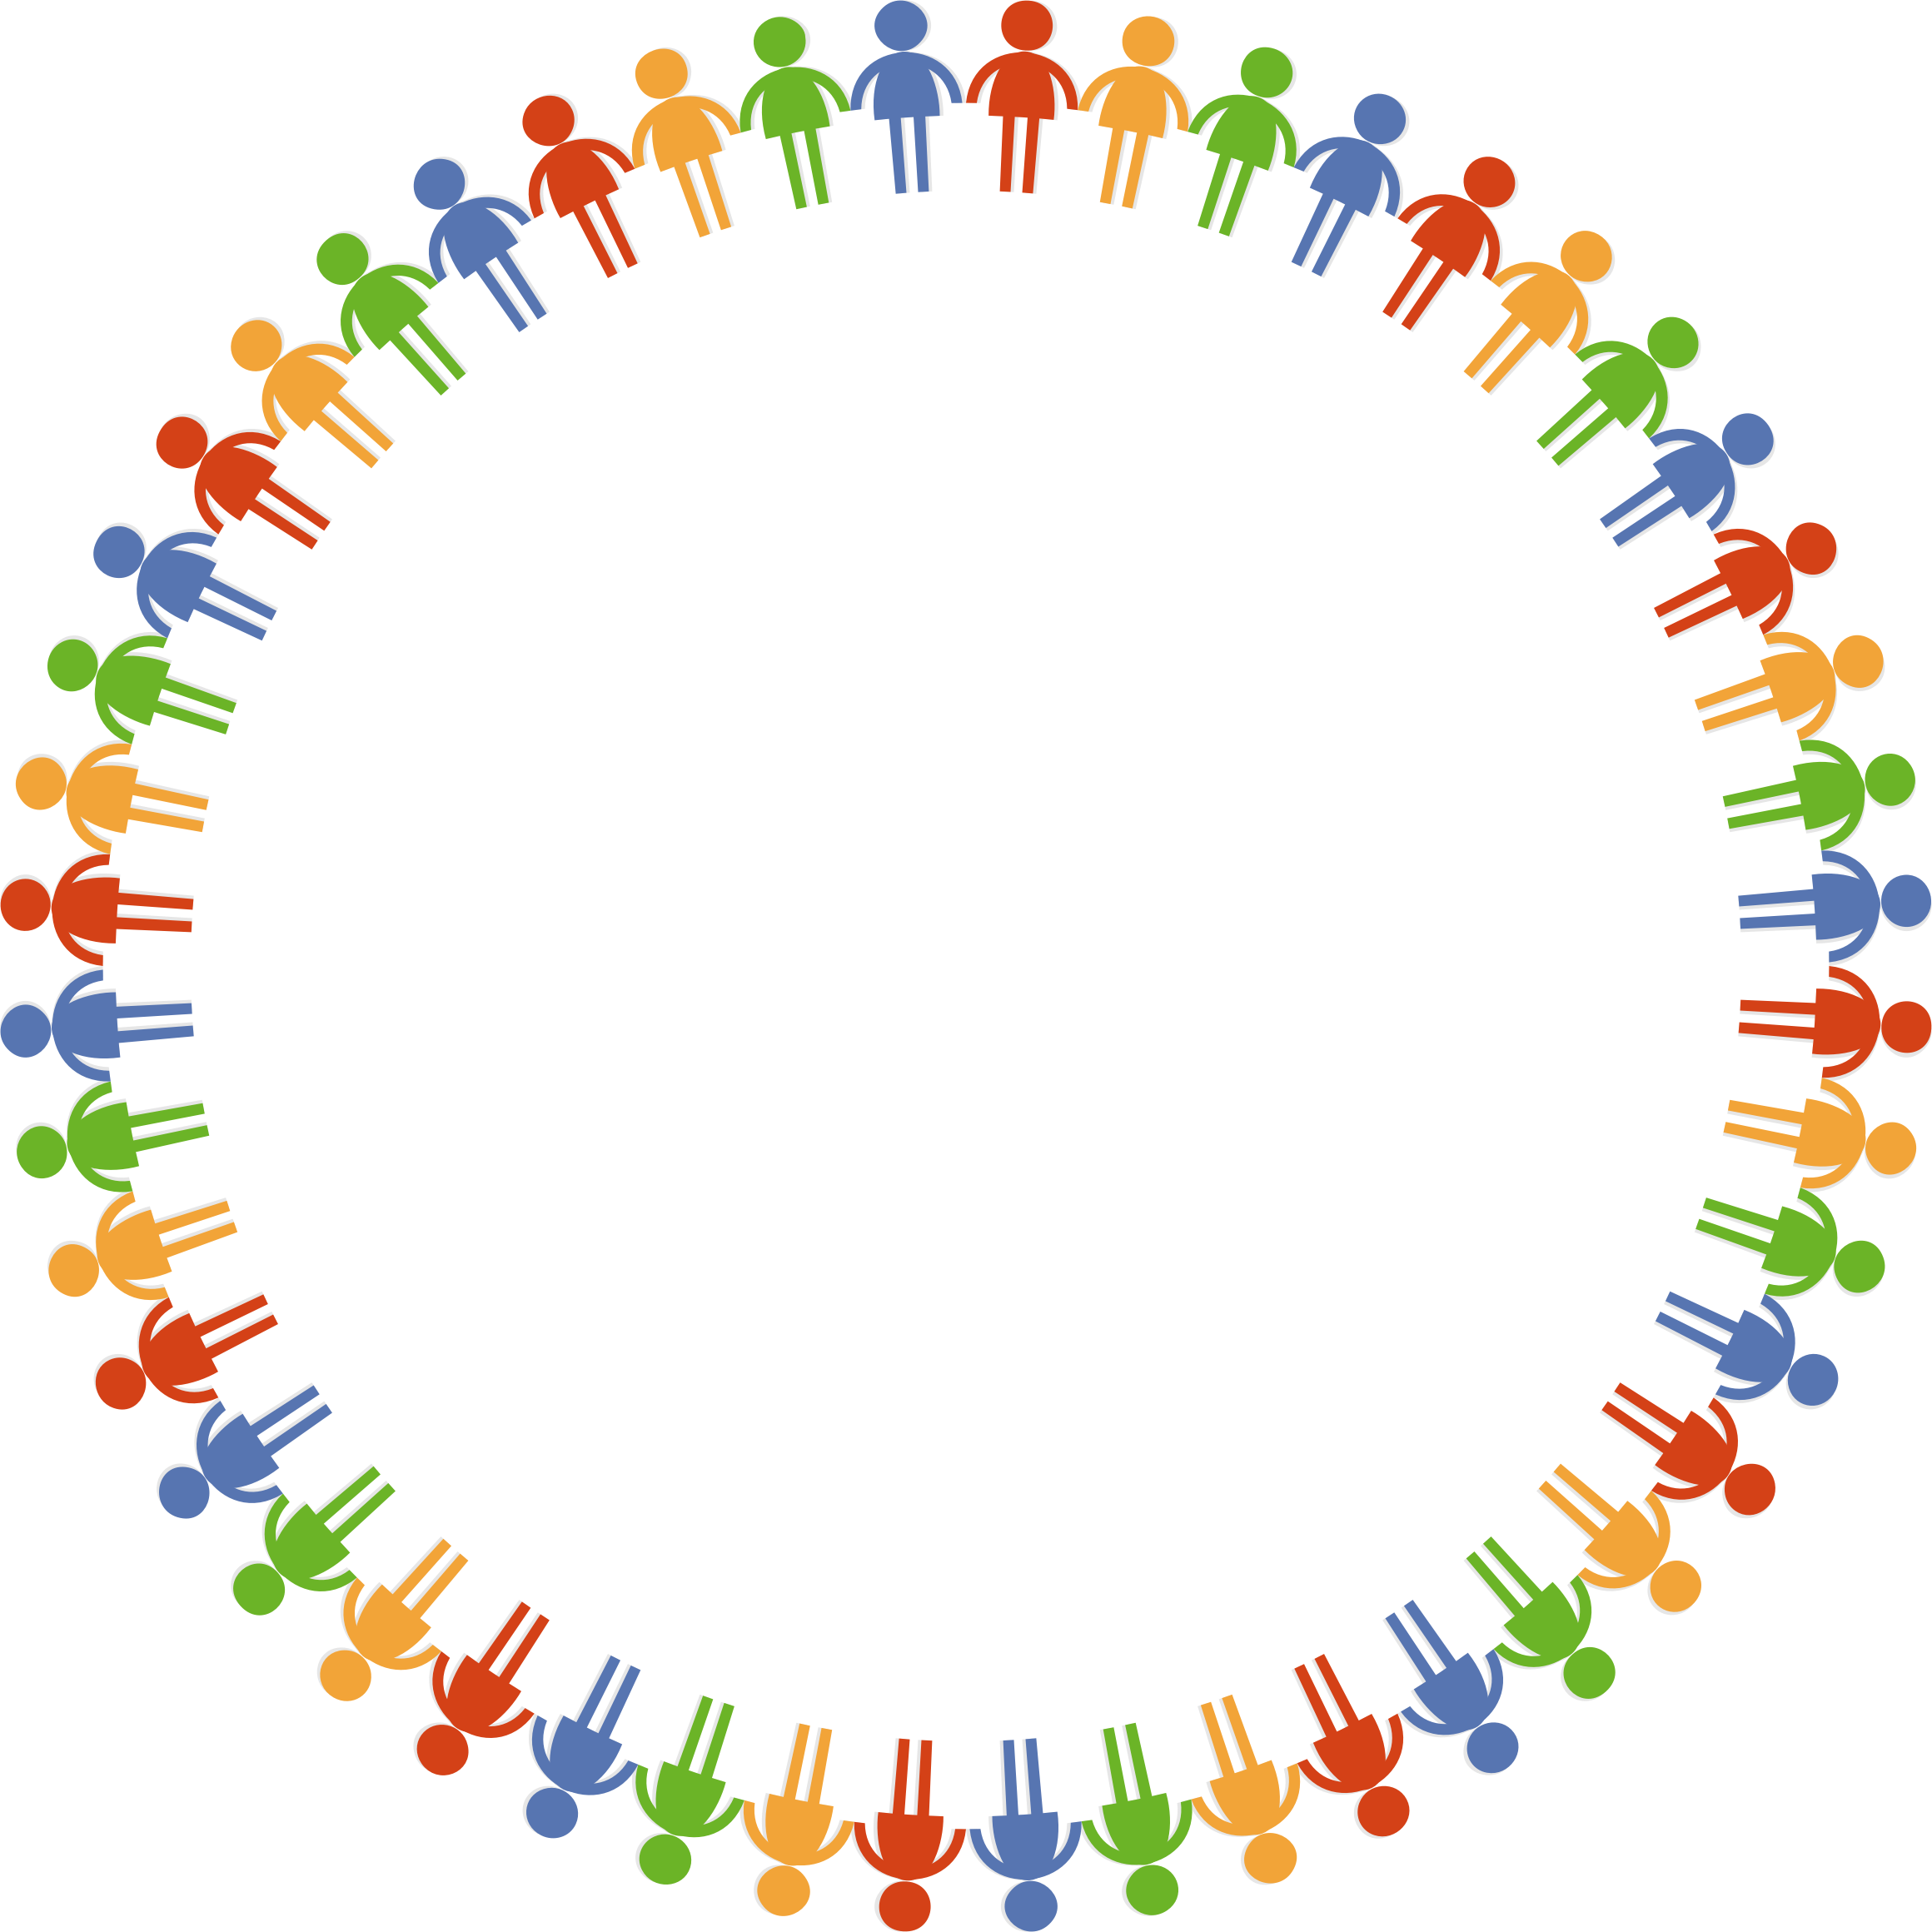 Free Community Clip Art, Download Free Clip Art, Free Clip.